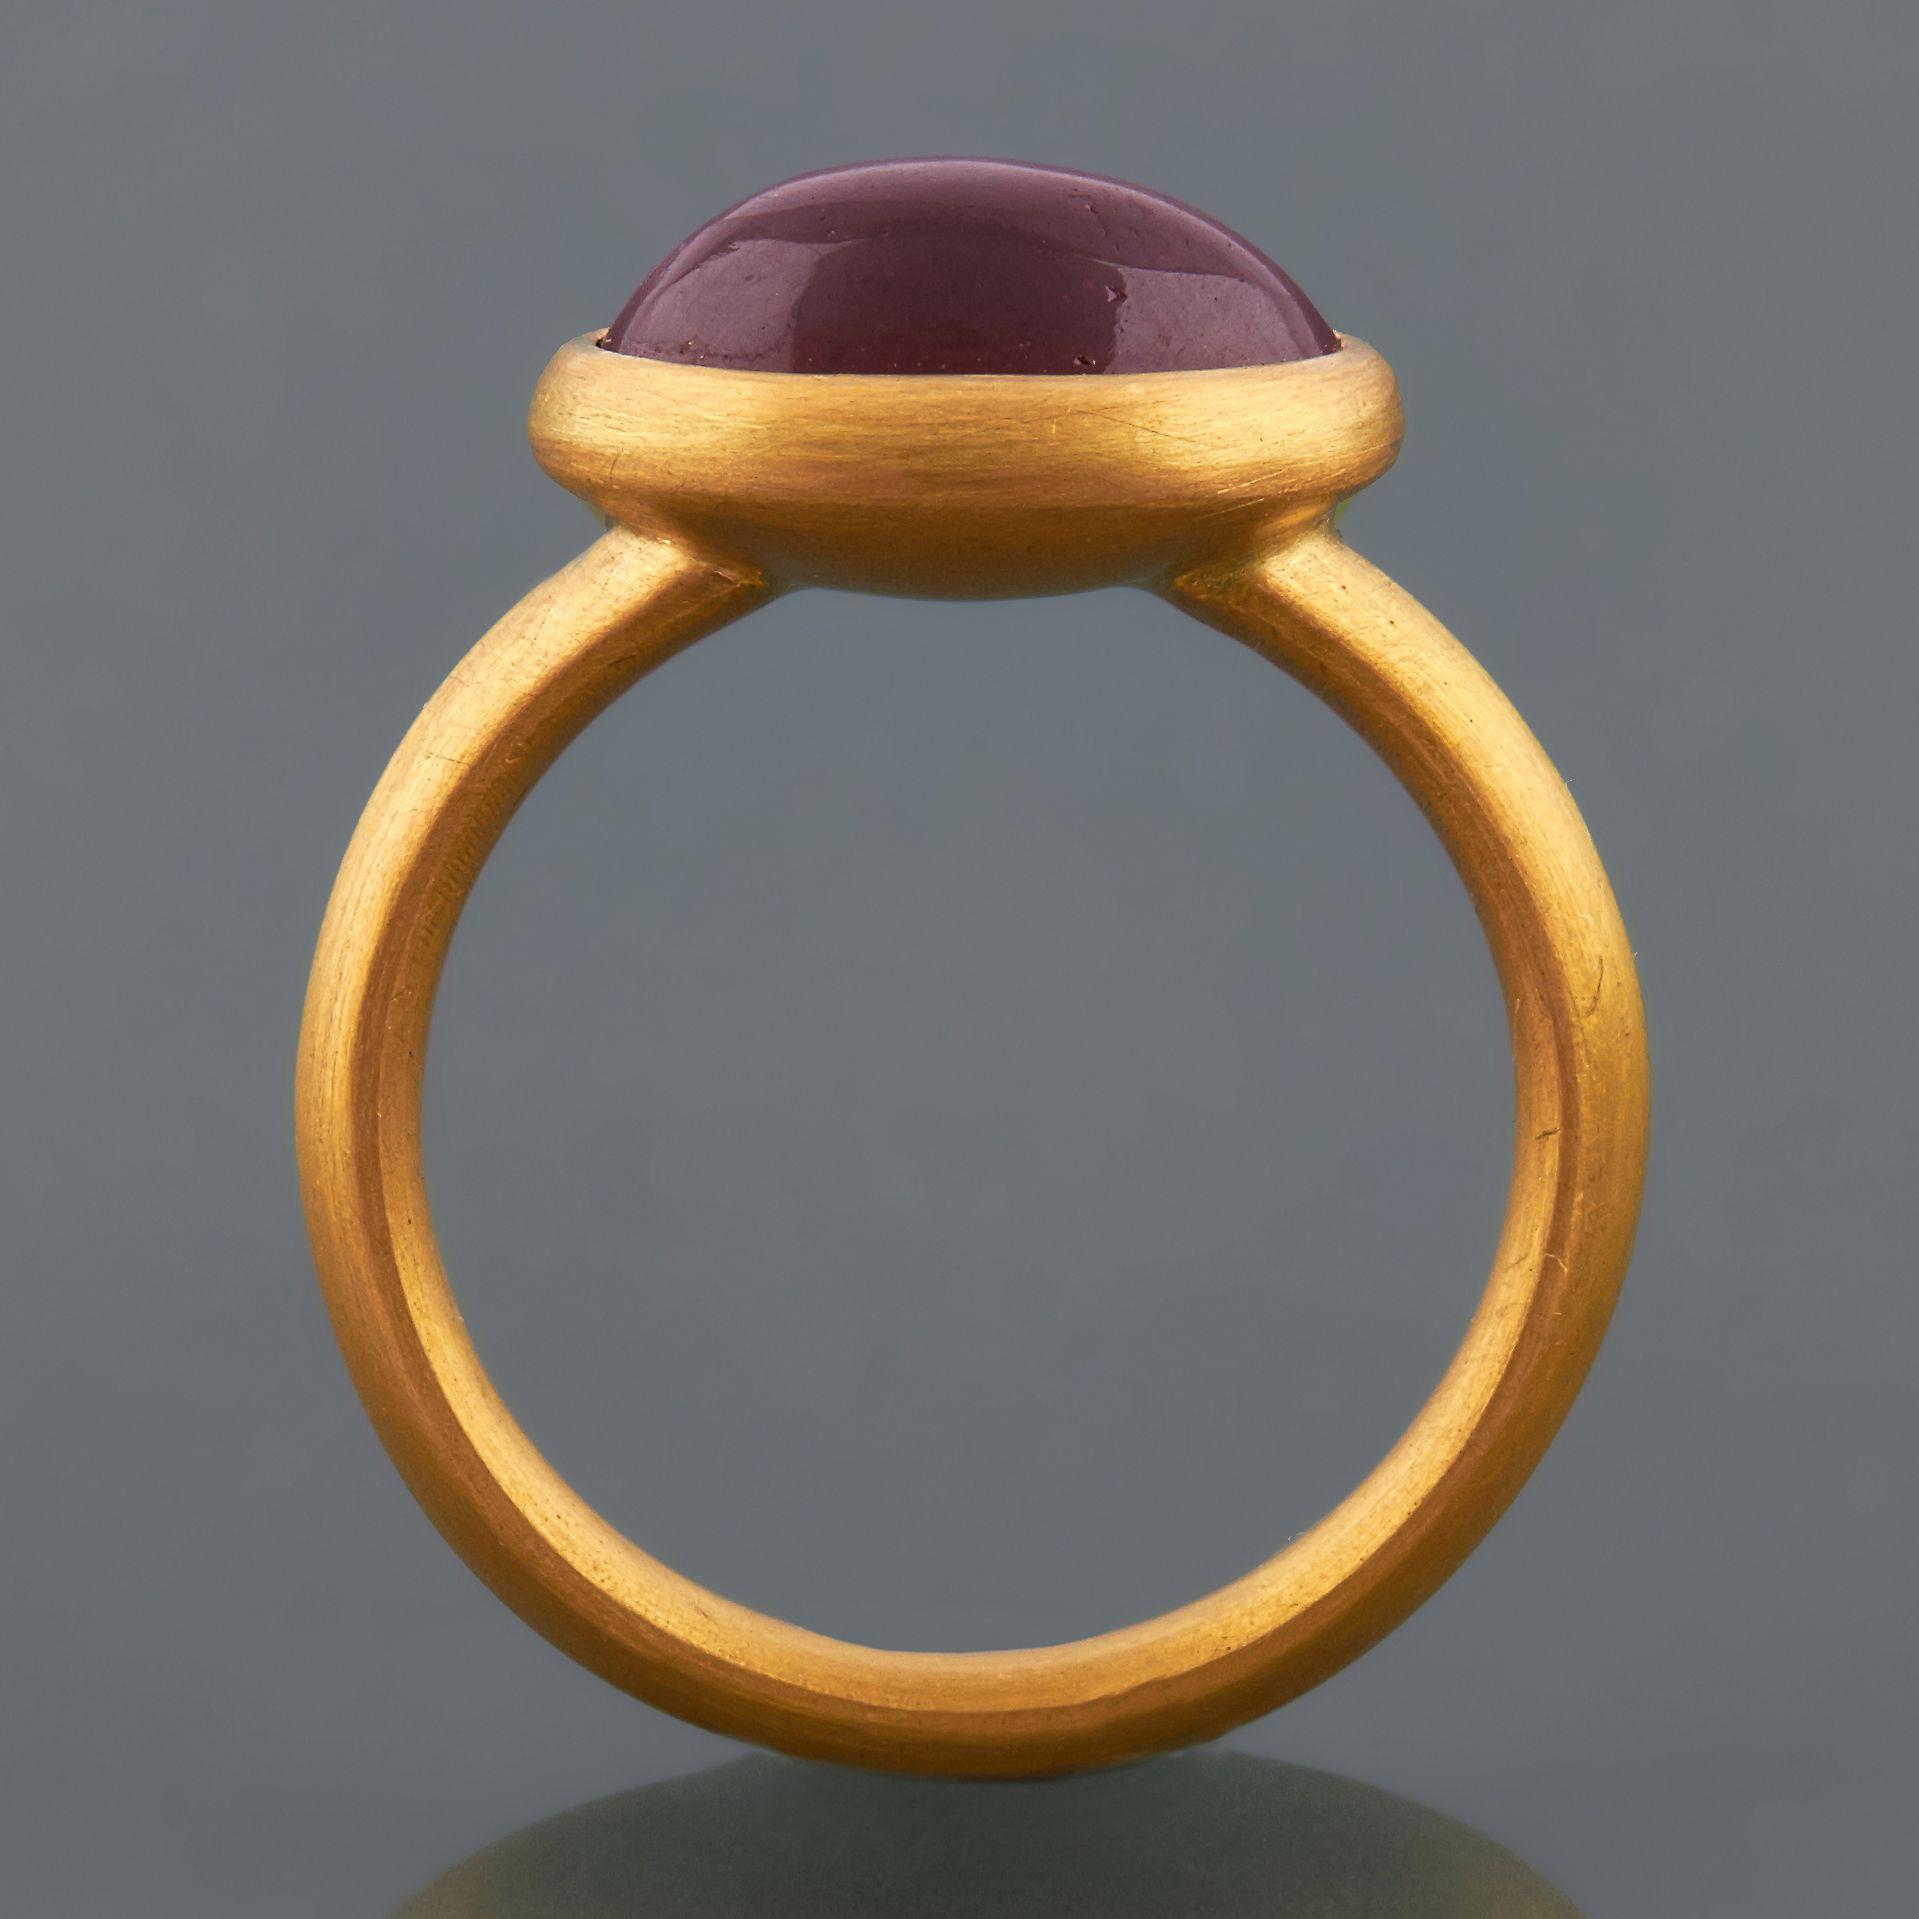 Garnet Ring In 22ct Gold by Deborah Cadby httpwww